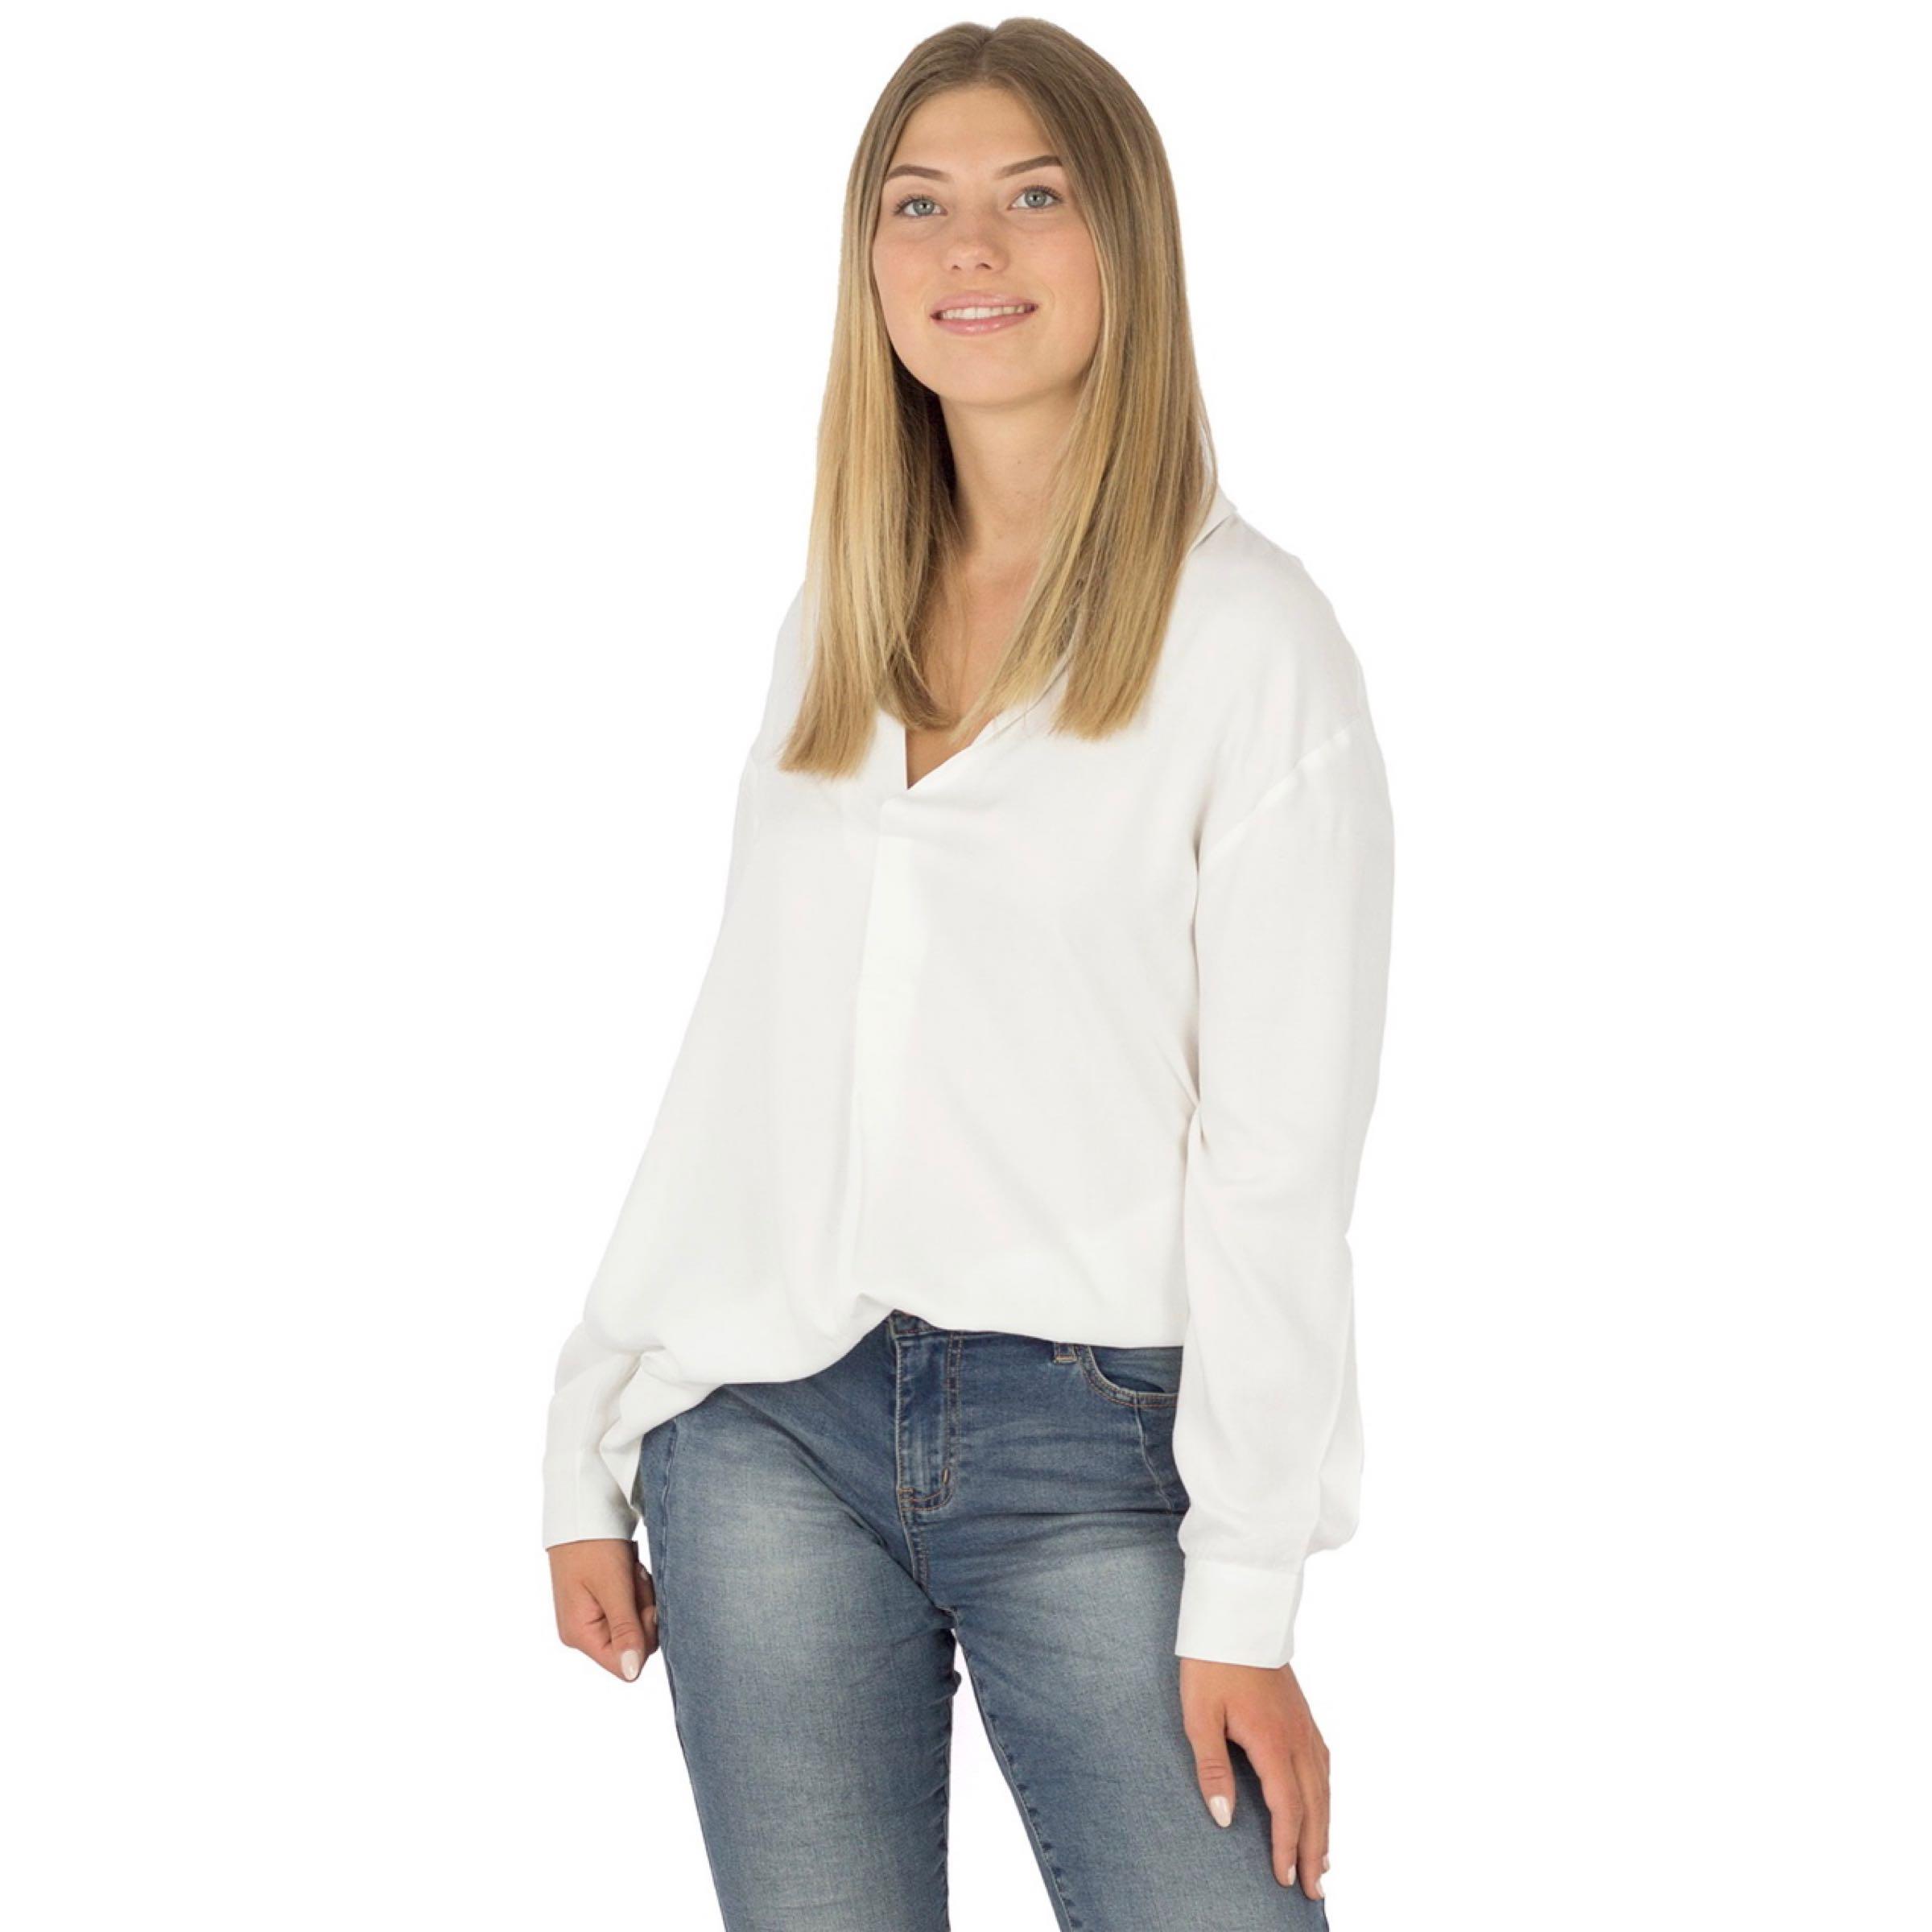 Bonnie shirt, white